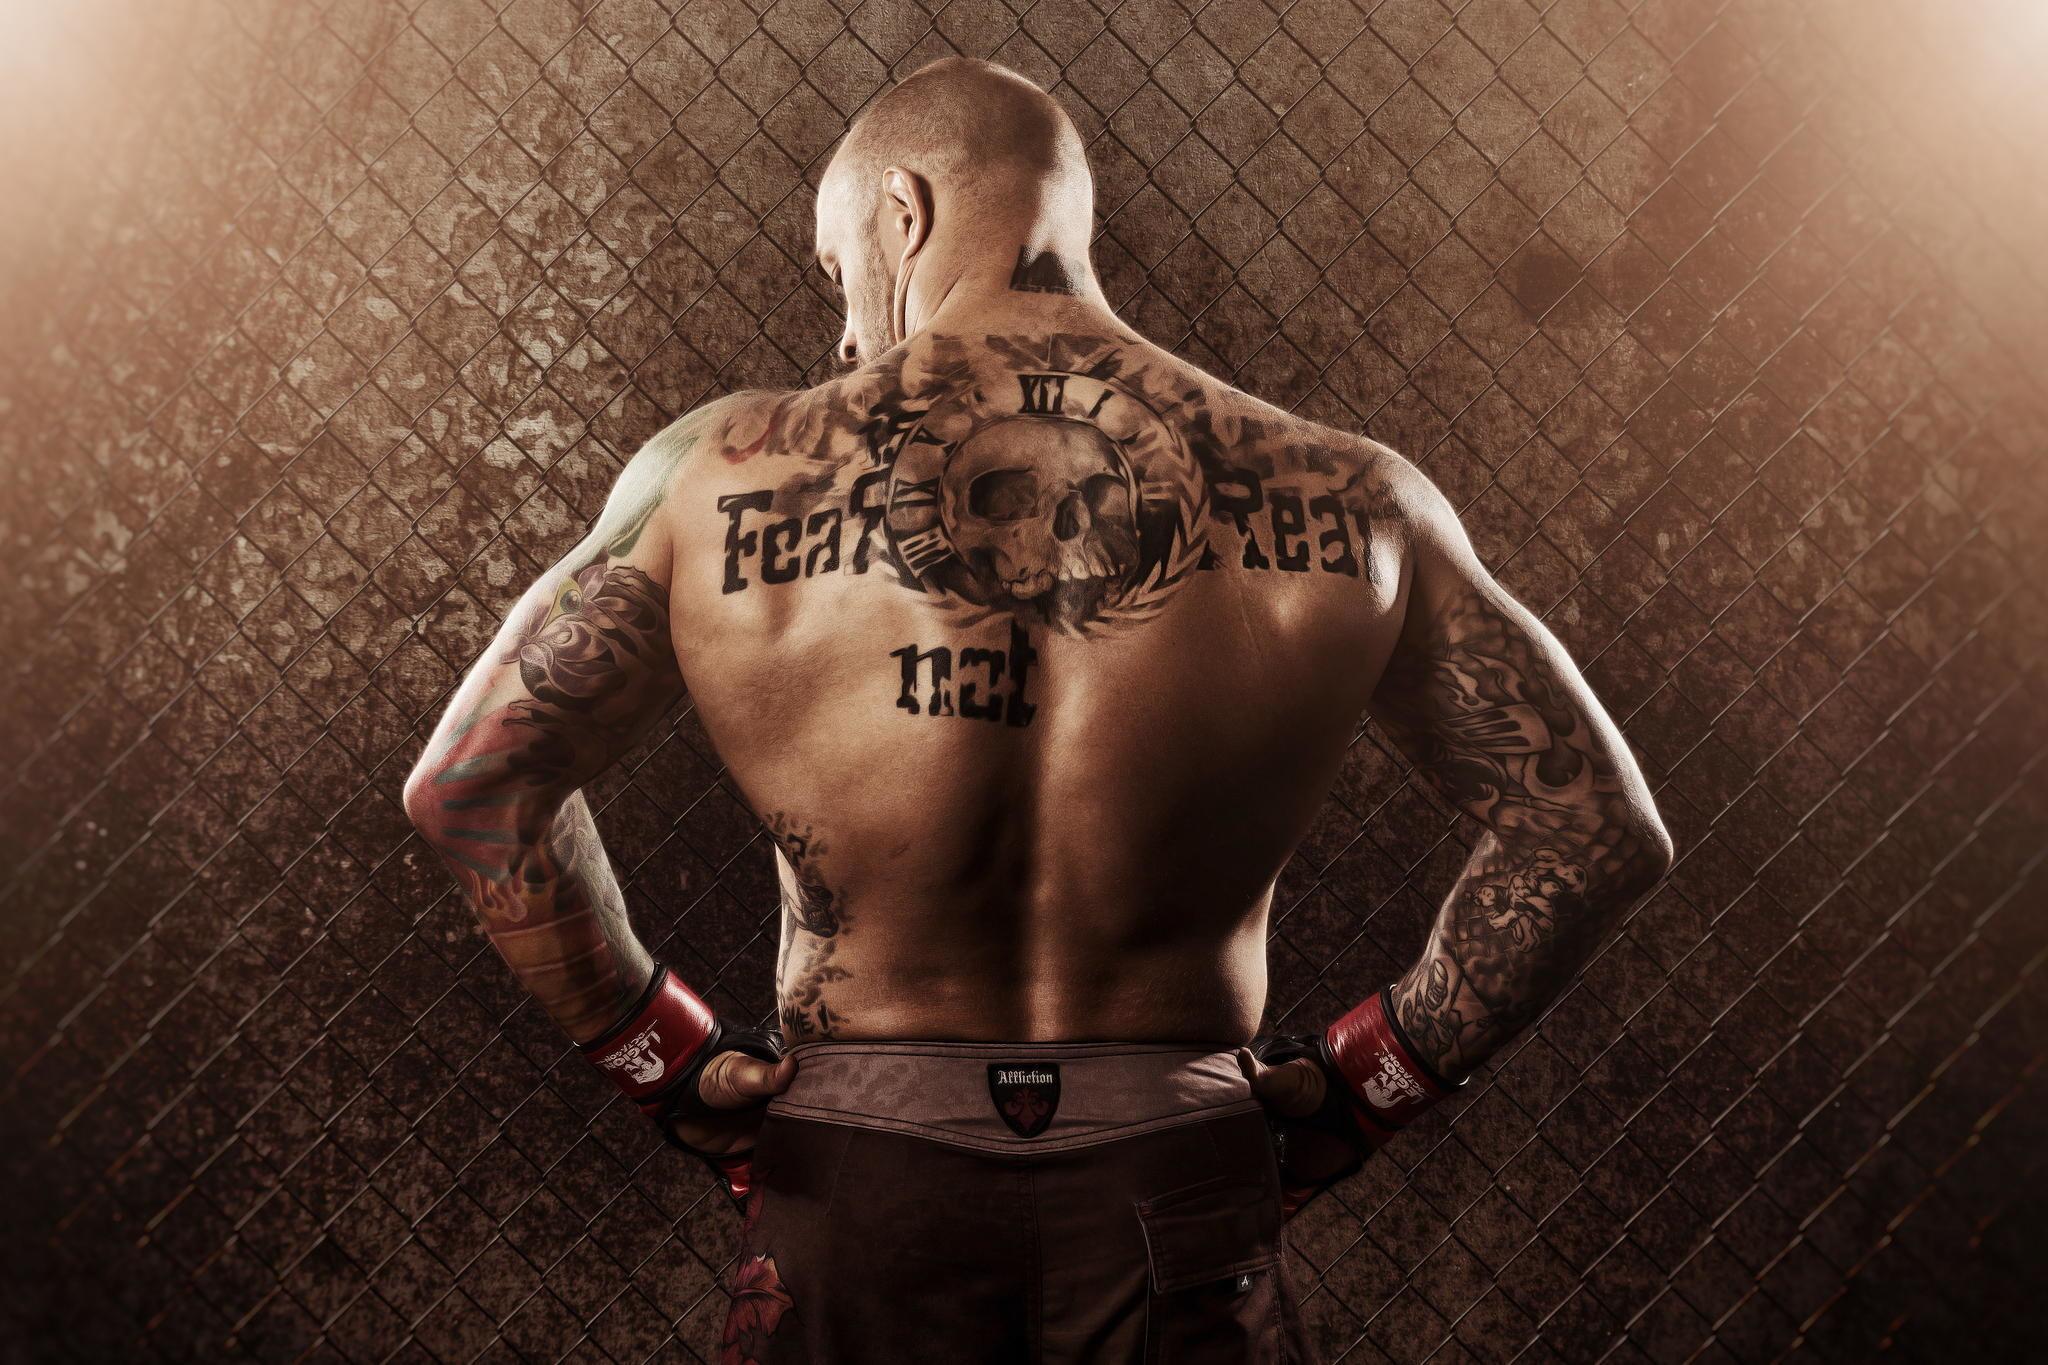 Res: 2048x1365, Wallpaper Mma, Mixed martial arts, Athlete, Tattoos, Mixed martial arts HD,  Picture, Image